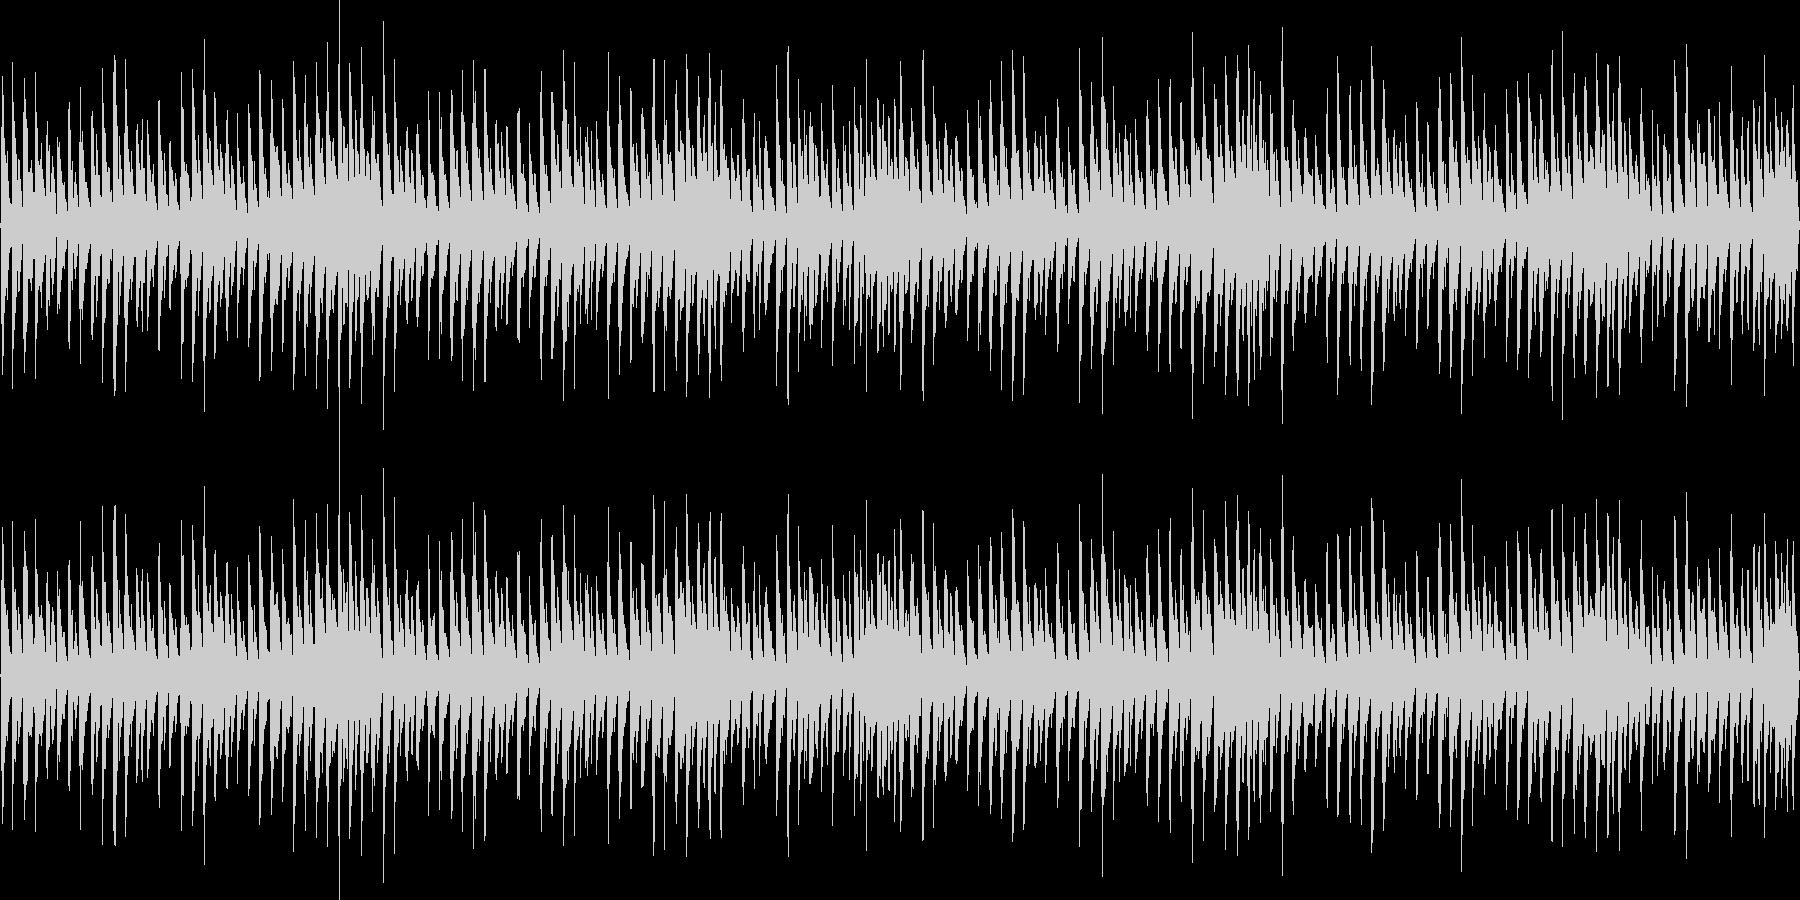 8bit、四つ打ちのチップチューンの未再生の波形